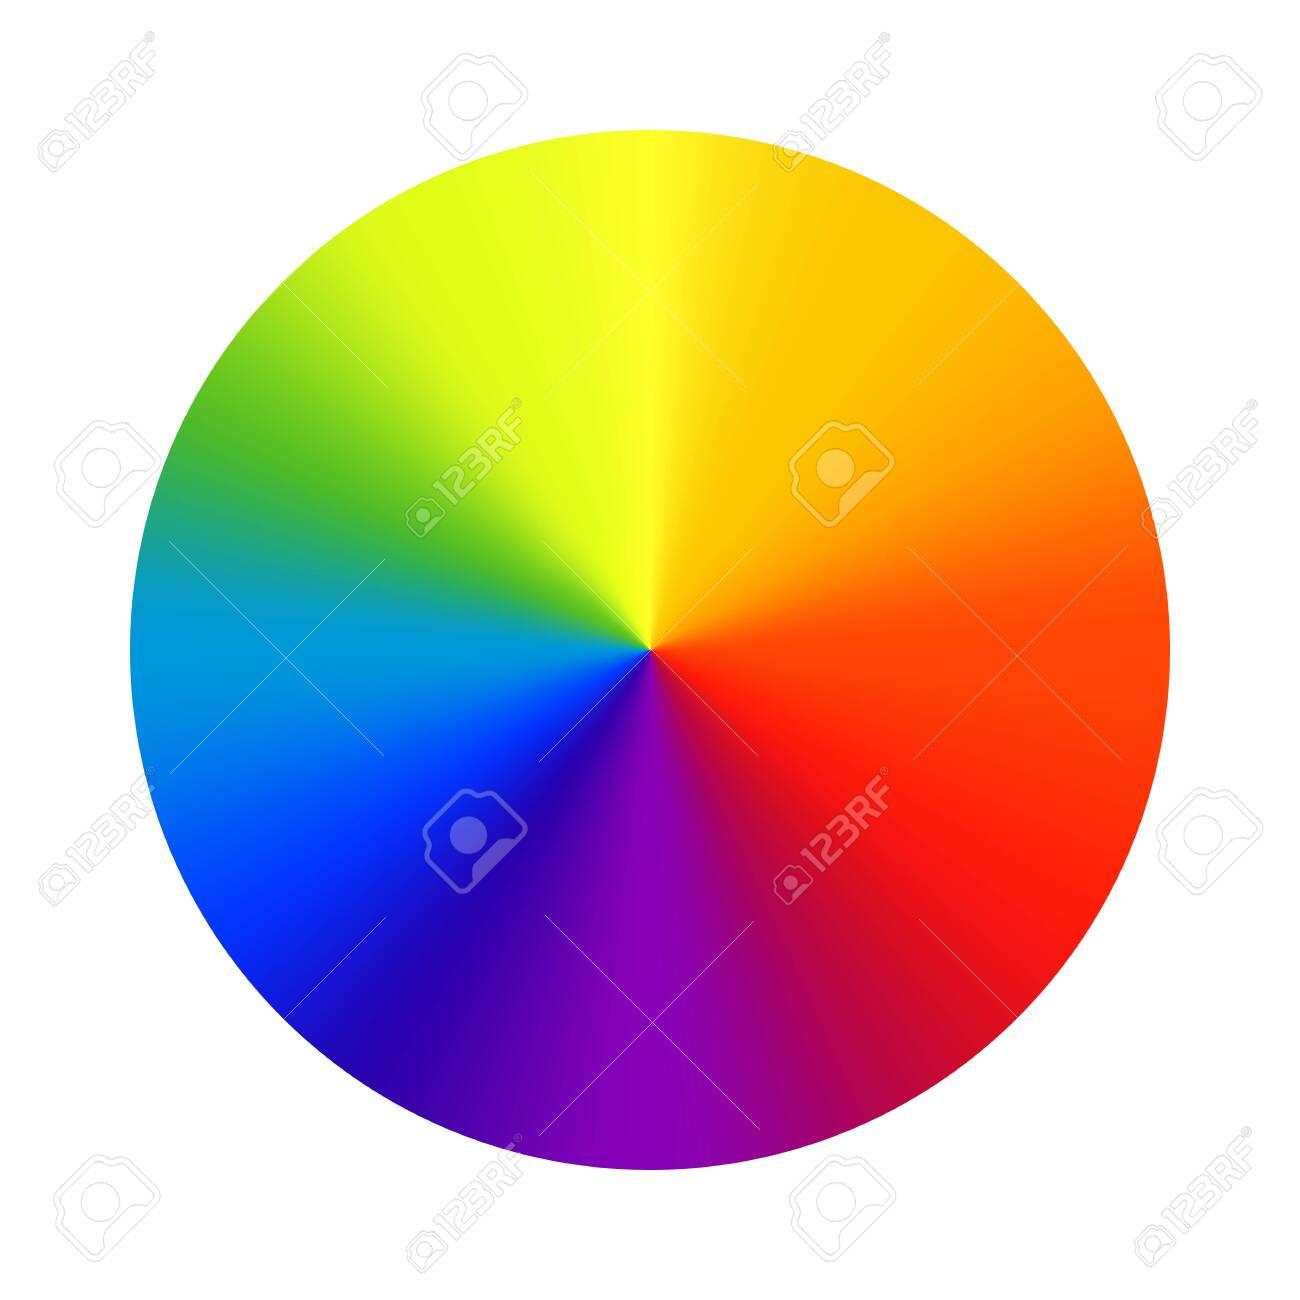 Color wheel palette. RGB, RYB, CYMK system. Color harmony. Vector Illustration. - 142029497